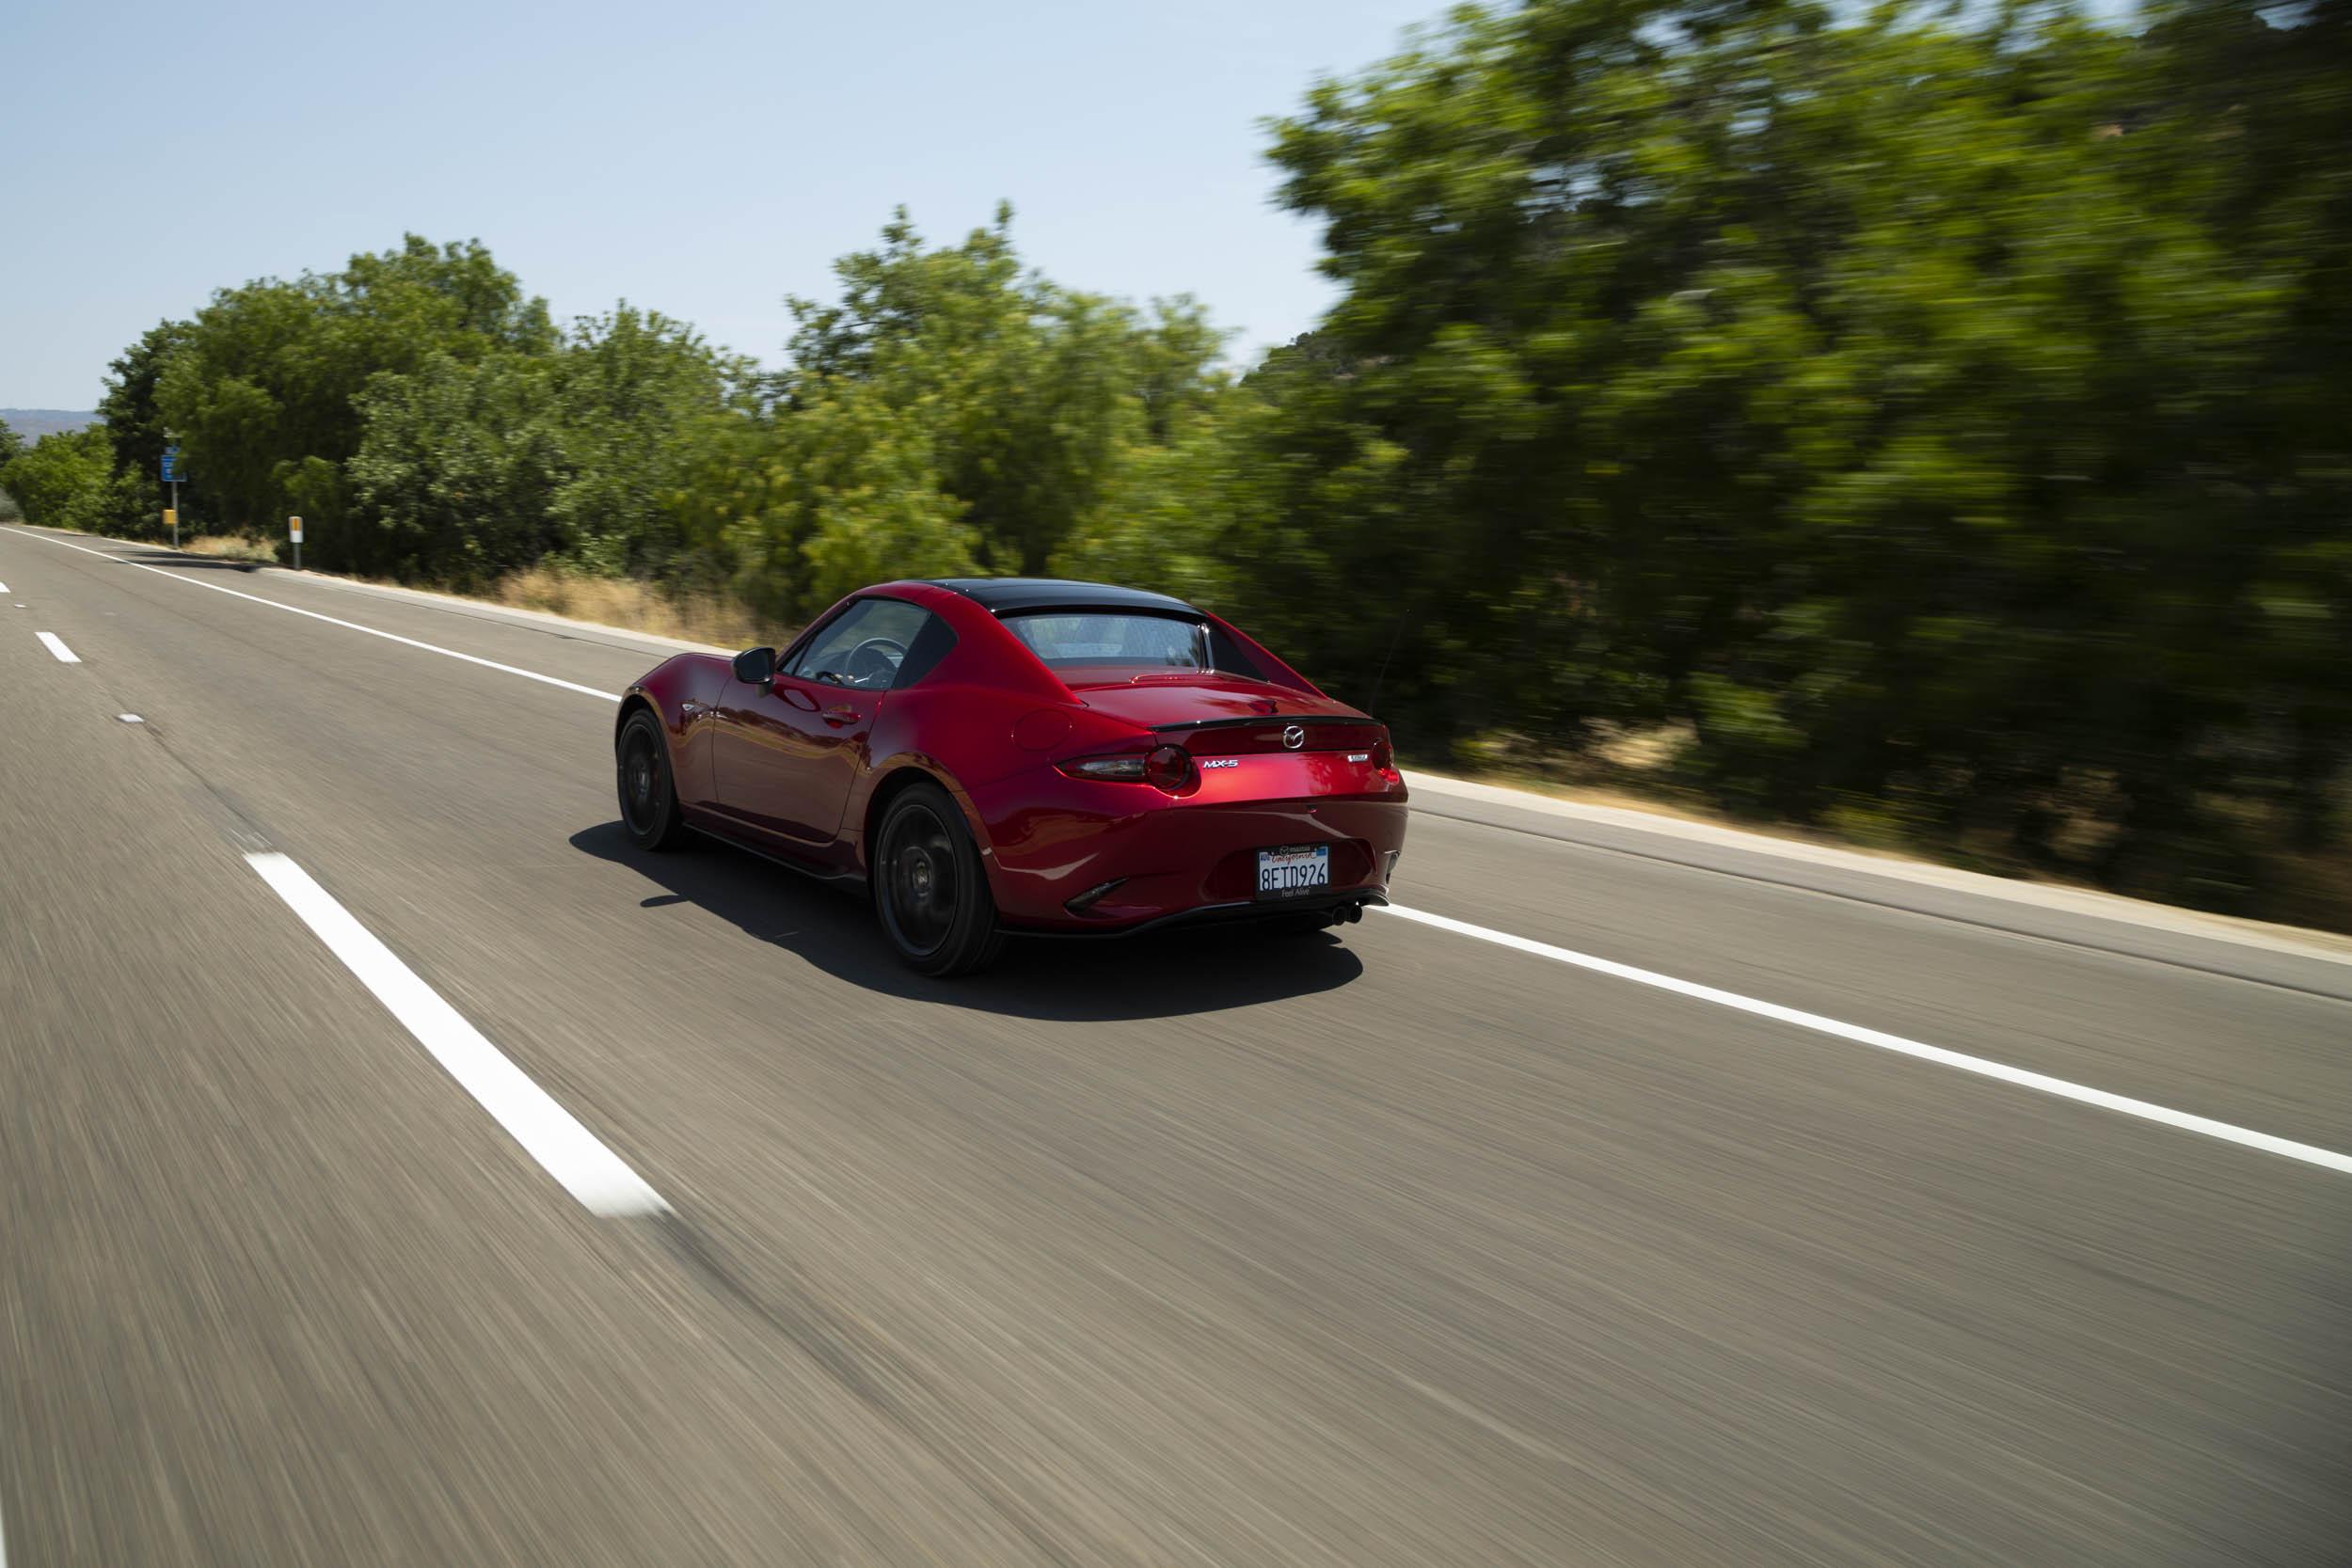 2019 Mazda MX-5 Miata Roadster rear 3/4 driving